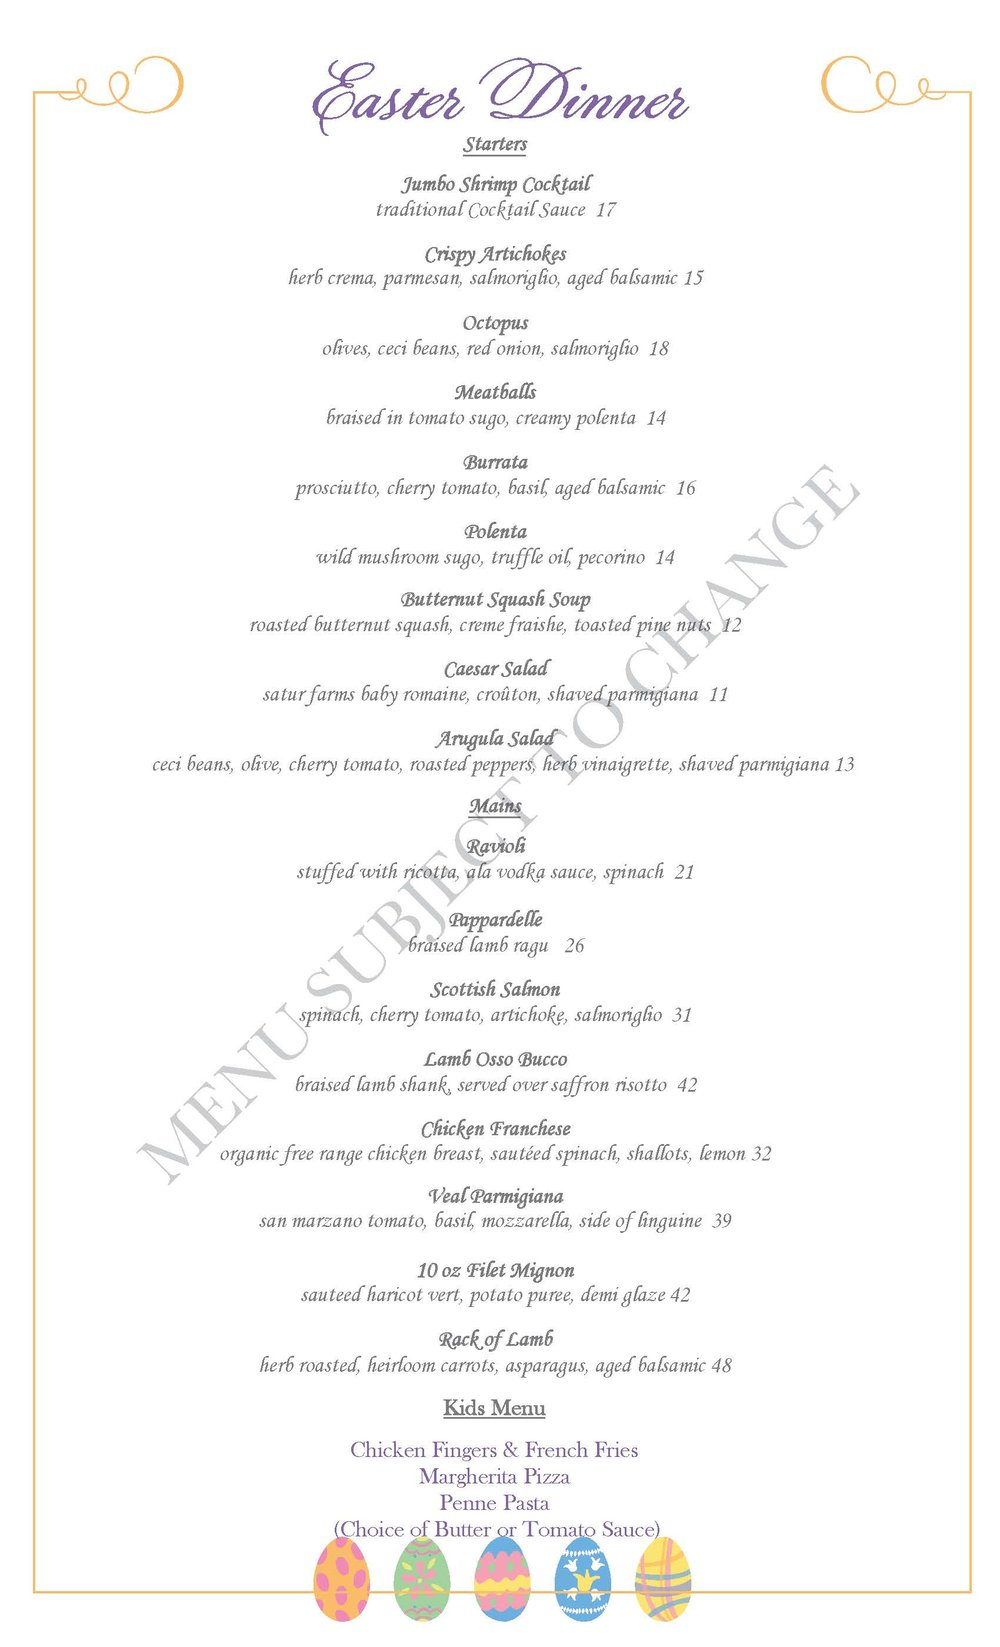 PRIMI_Easter_Dinner 2019_Page_1.jpg